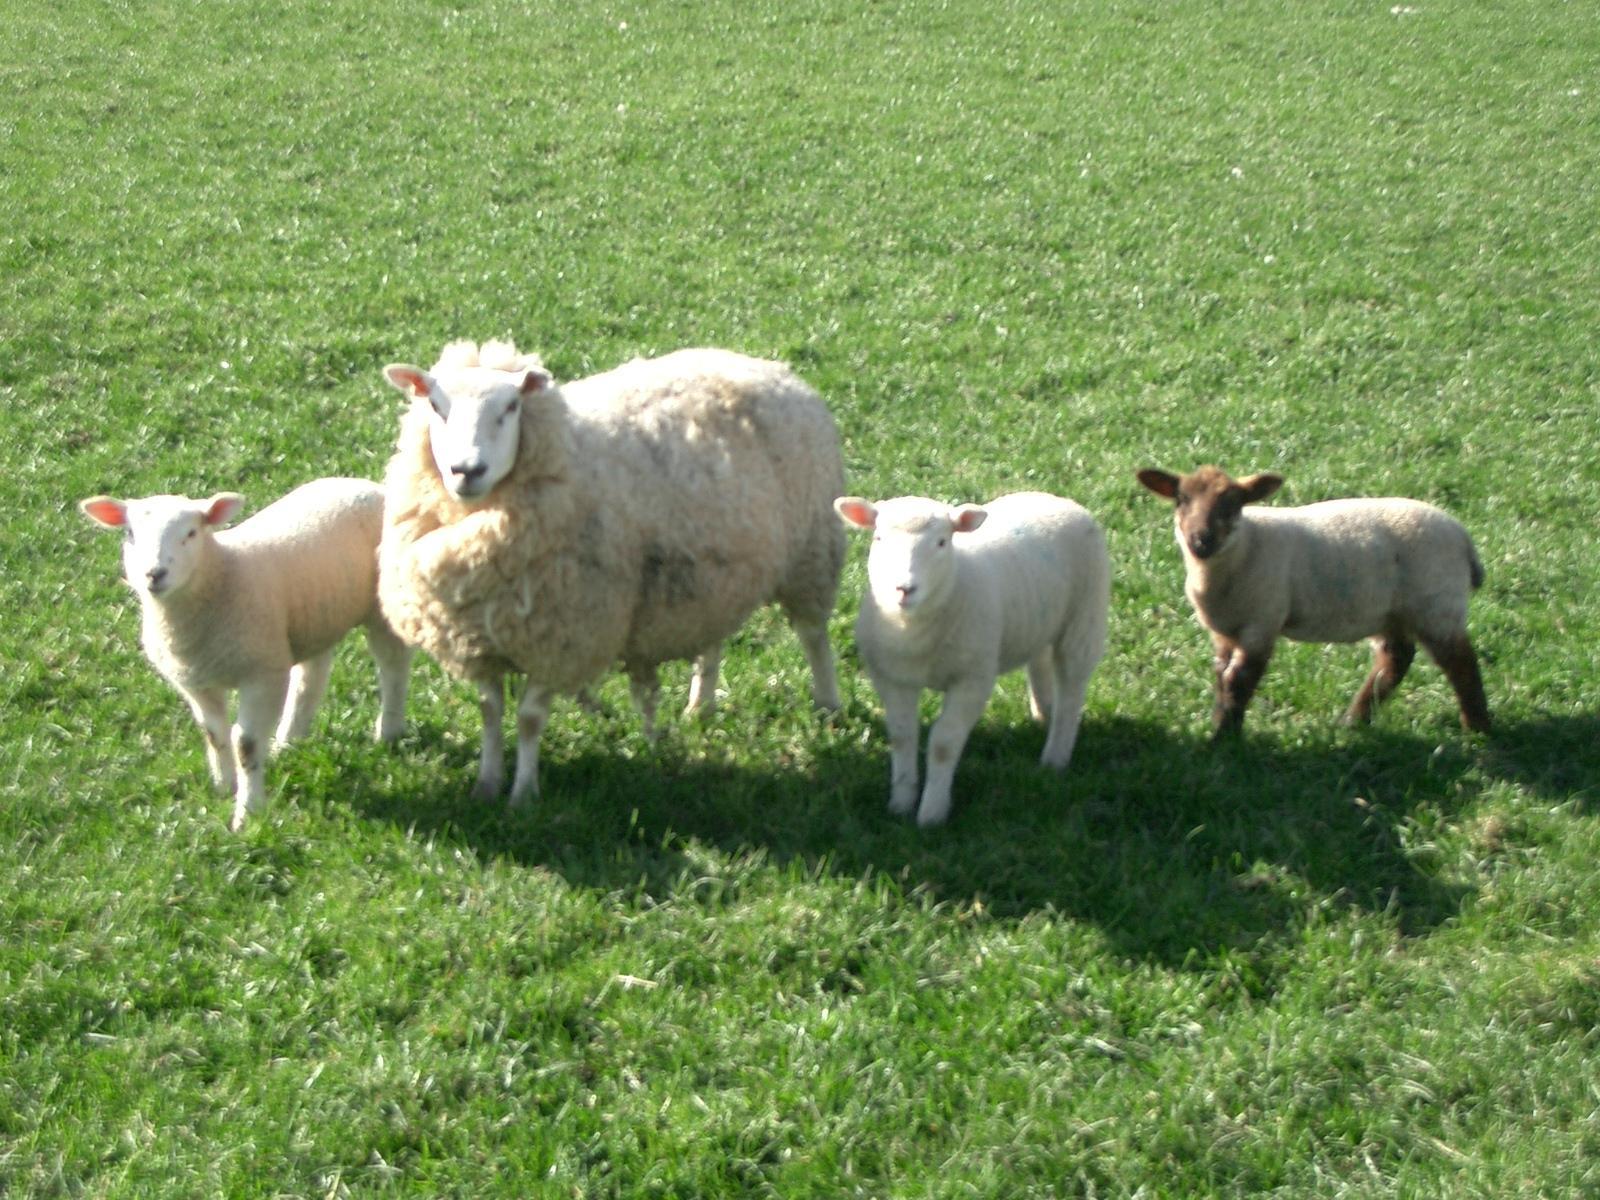 Sheep-Wallpaper-On-Desktop